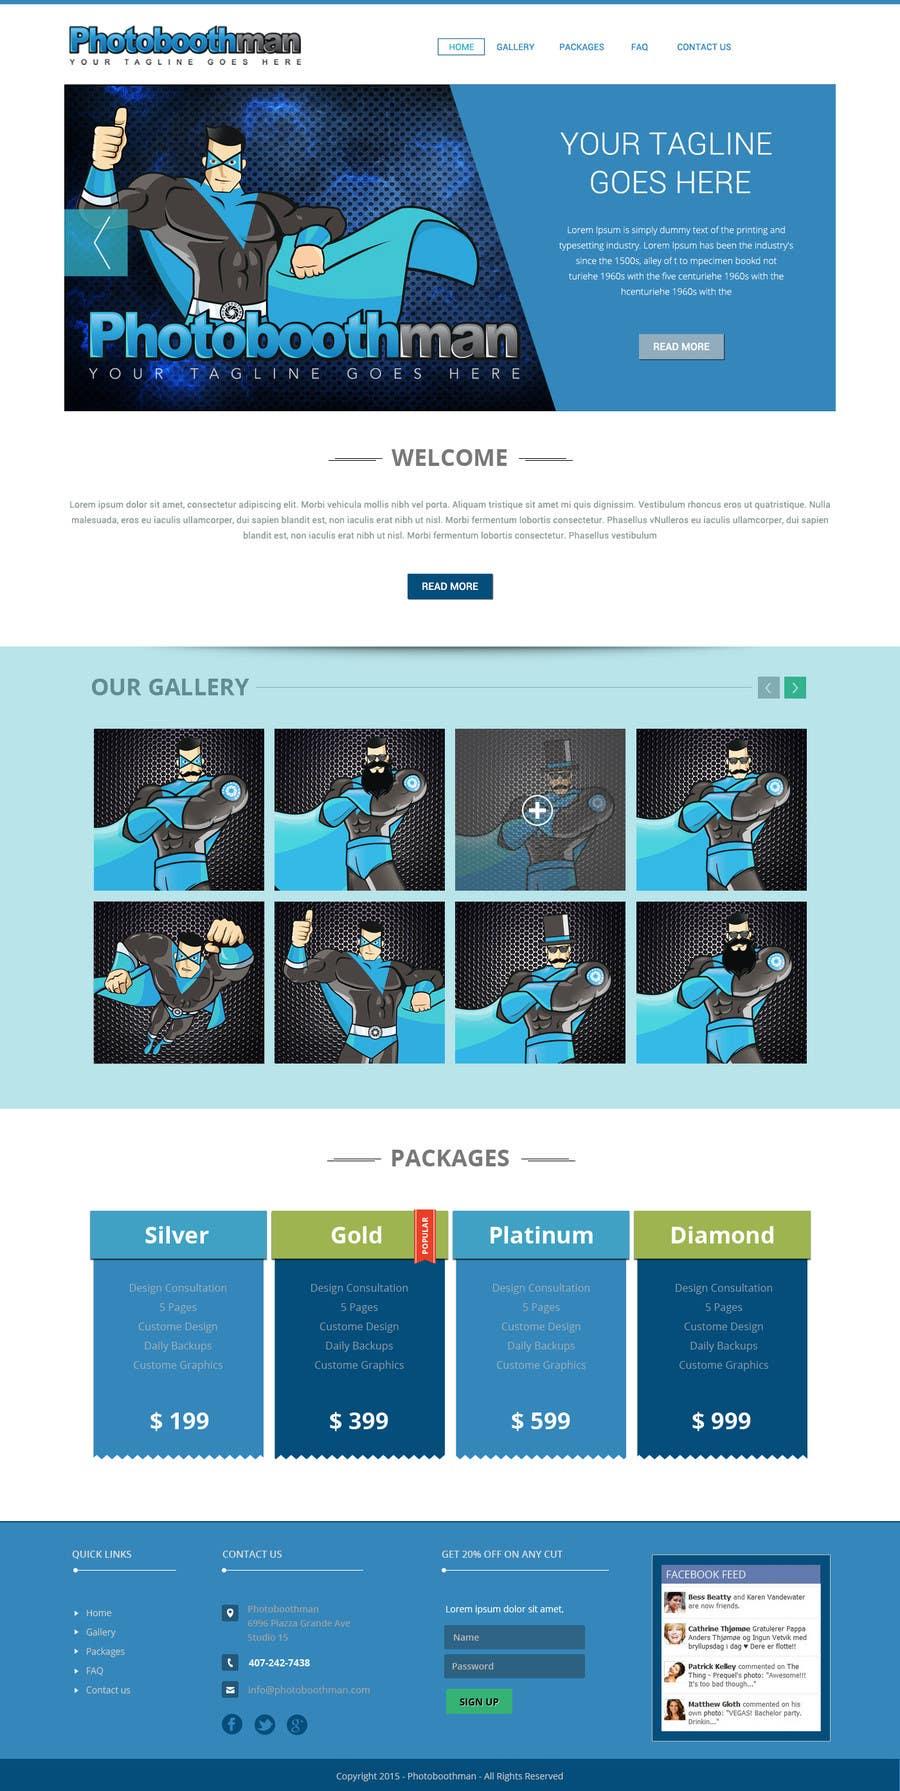 Bài tham dự cuộc thi #4 cho Design a Website Mockup & Business Card for Photobooth Company